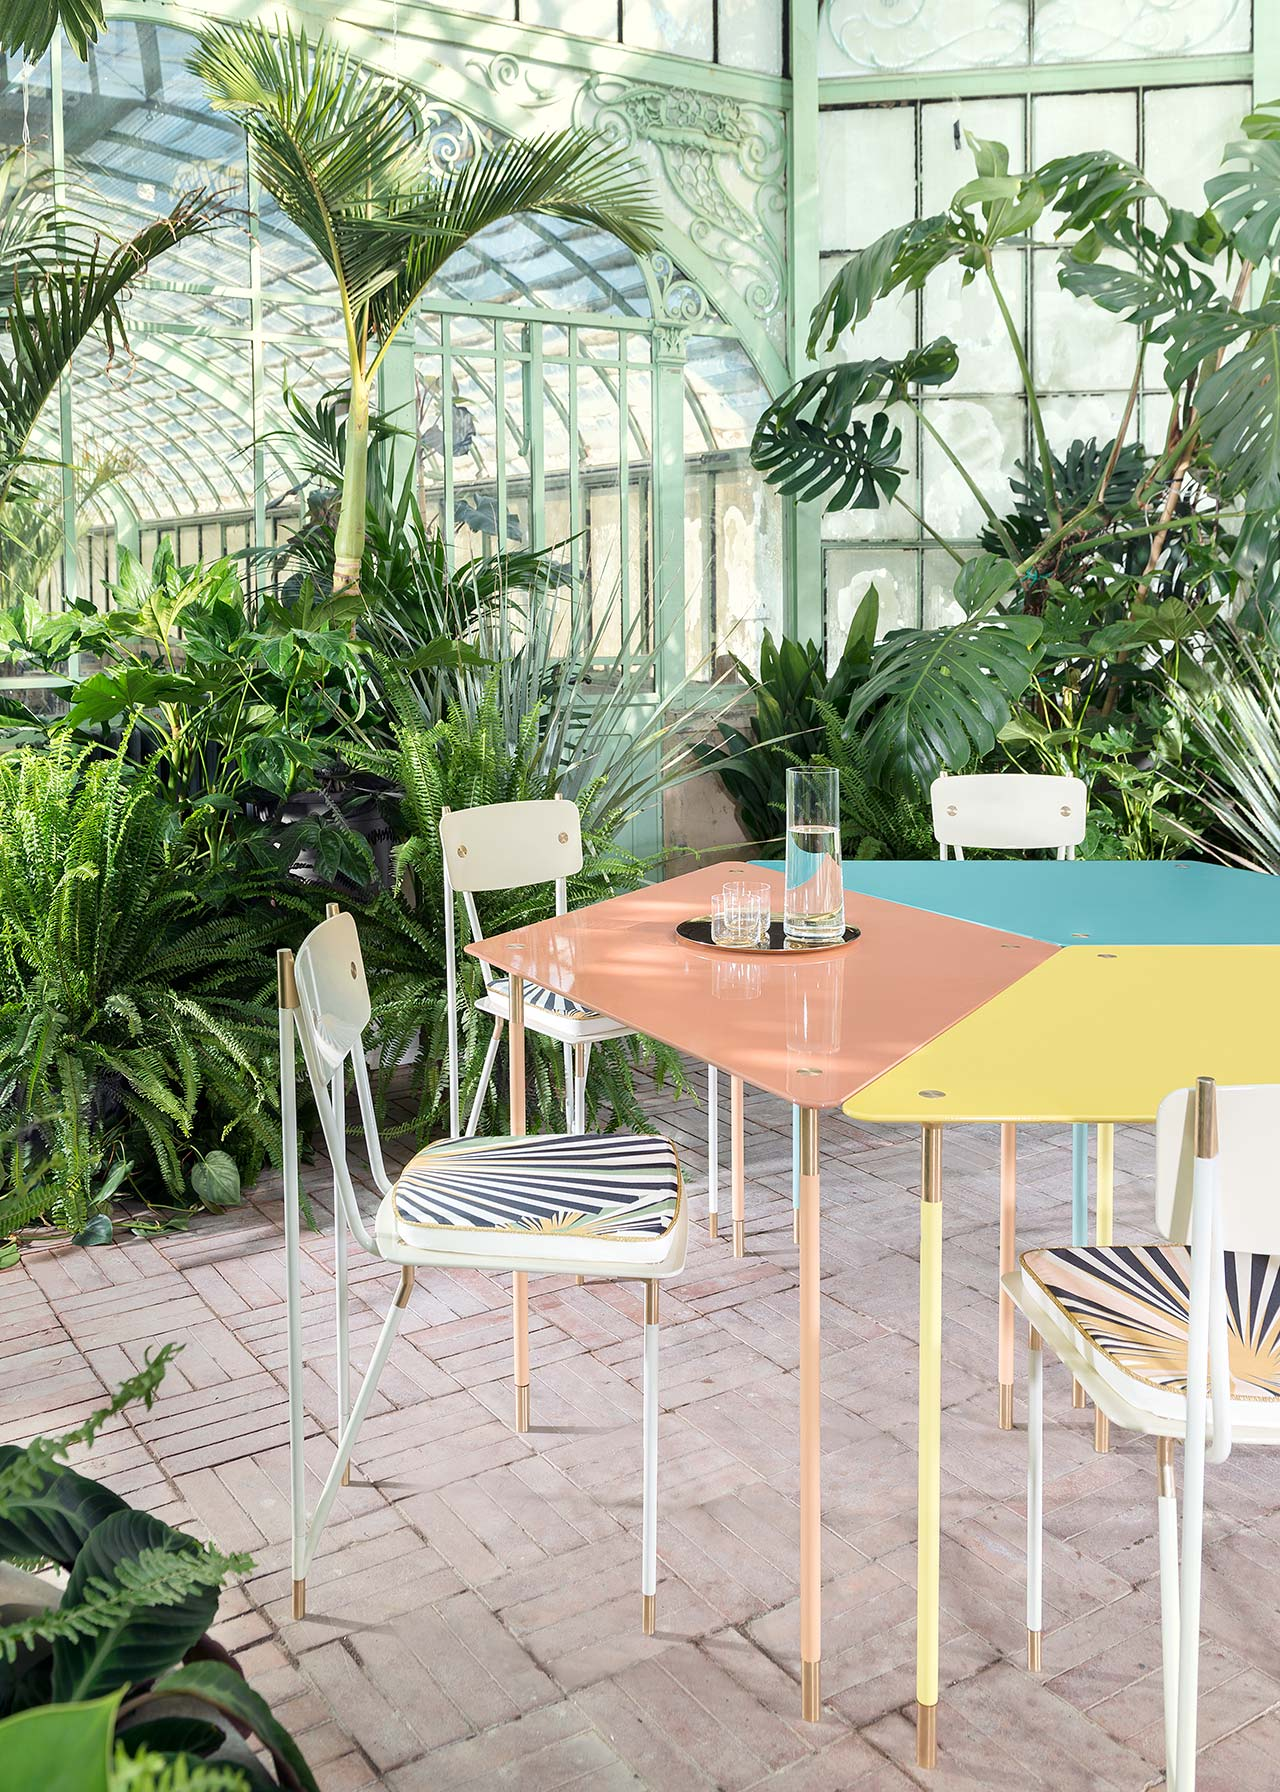 Aquiloni Collection,Milan.Landscaping Project: Derek Castiglioni.Furnitures: Derek Castiglioni.Photo by Maria Teresa Furnari.